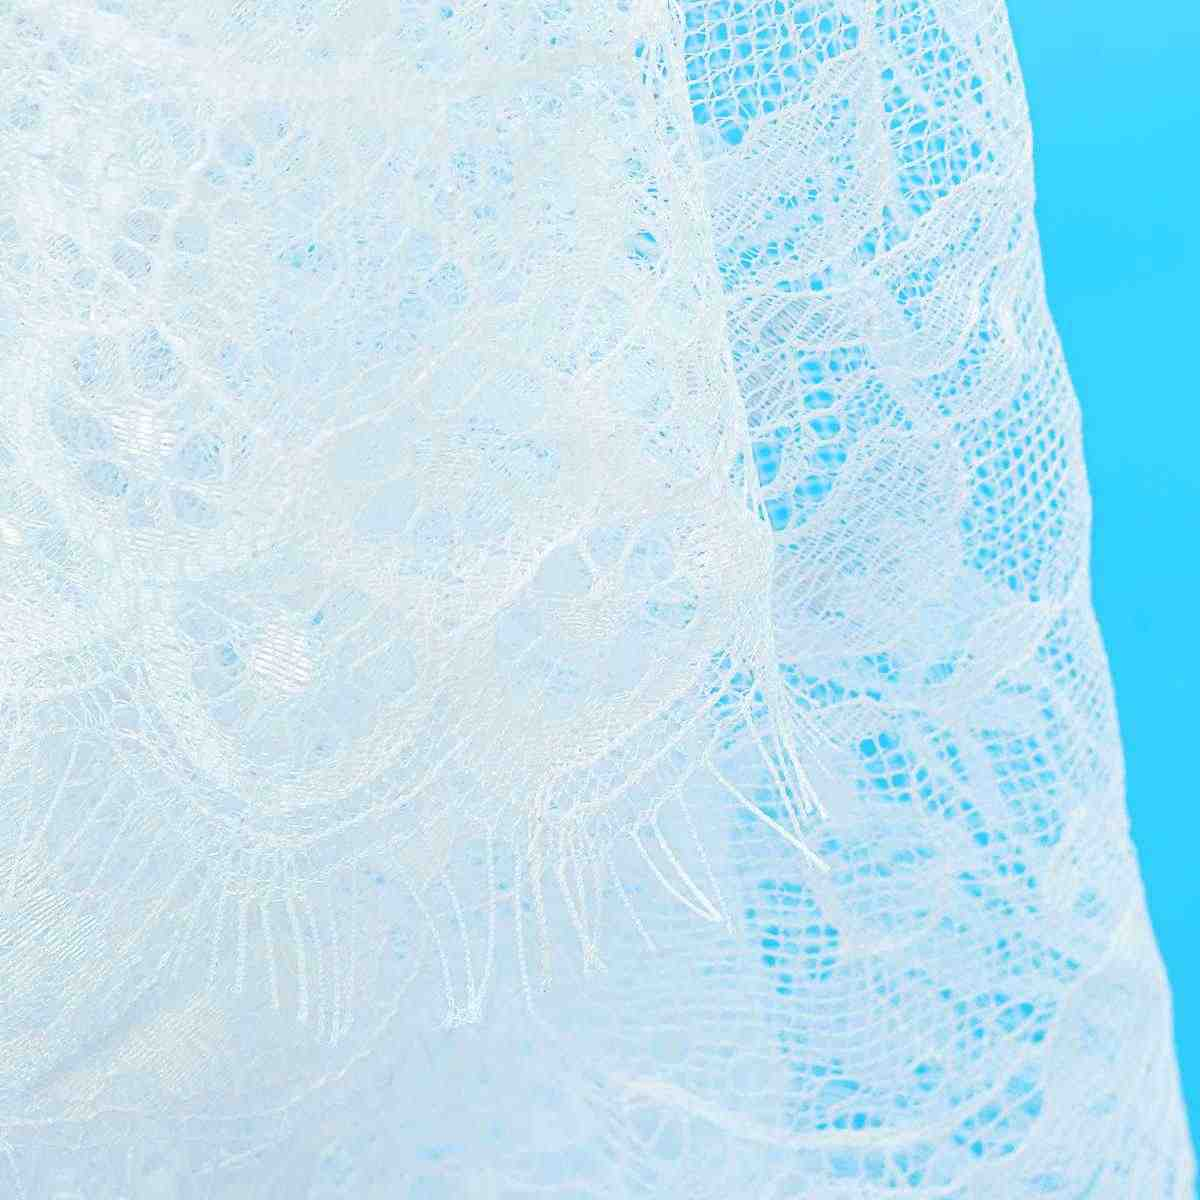 300X150 ซม.งานแต่งงาน Table Runner ลูกไม้สีขาวตาราง Runner ดอกไม้ตารางผ้า Bohos งานแต่งงานตารางตกแต่งสิ่งทอหน้าแรก